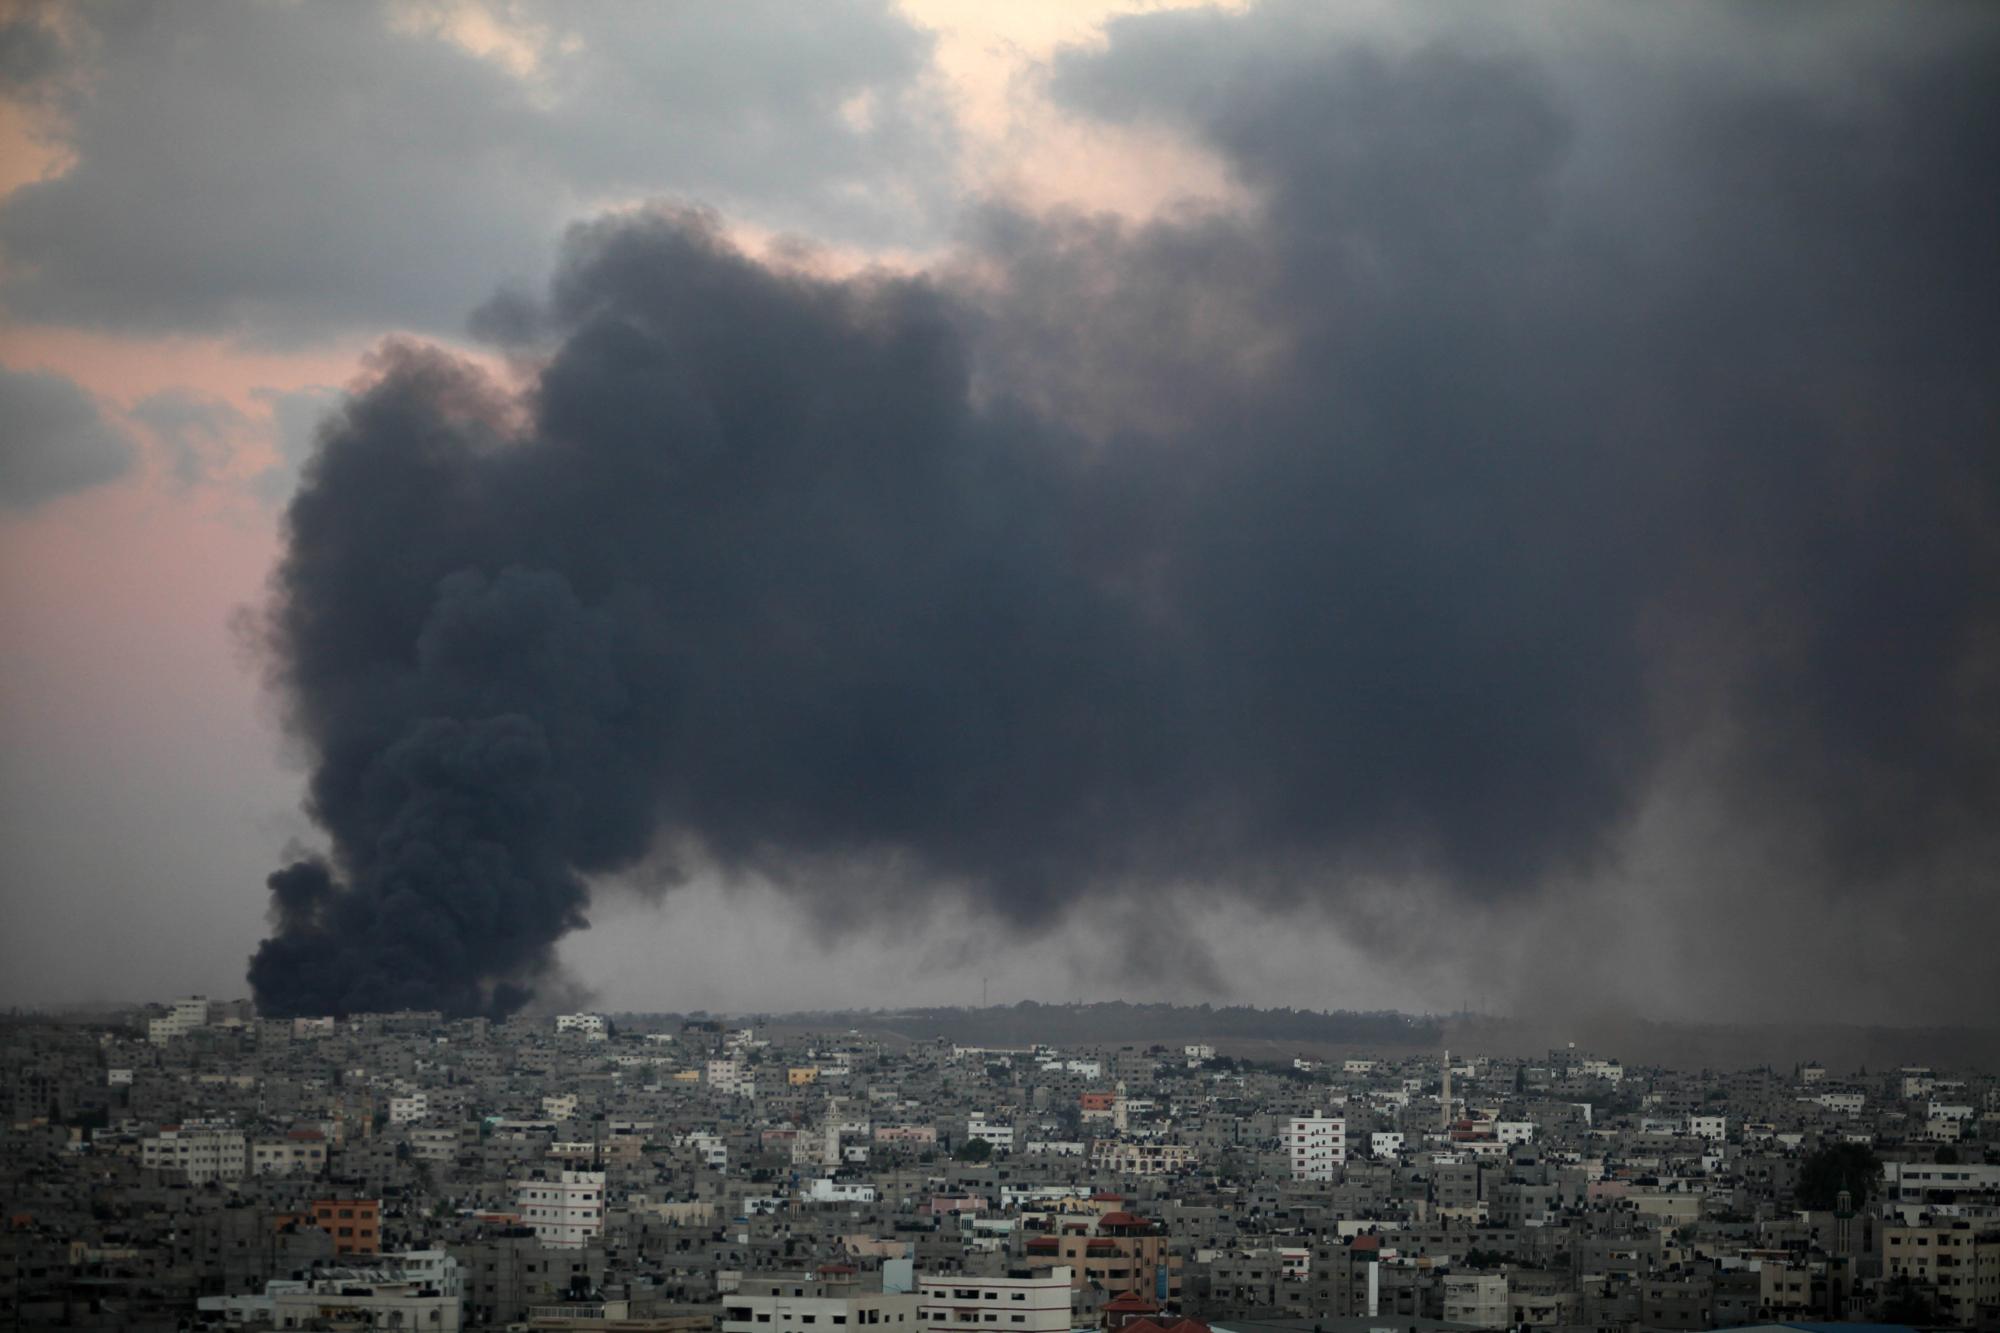 Smoke from an Israeli strike rises over the Gaza Strip, July 25, 2014.